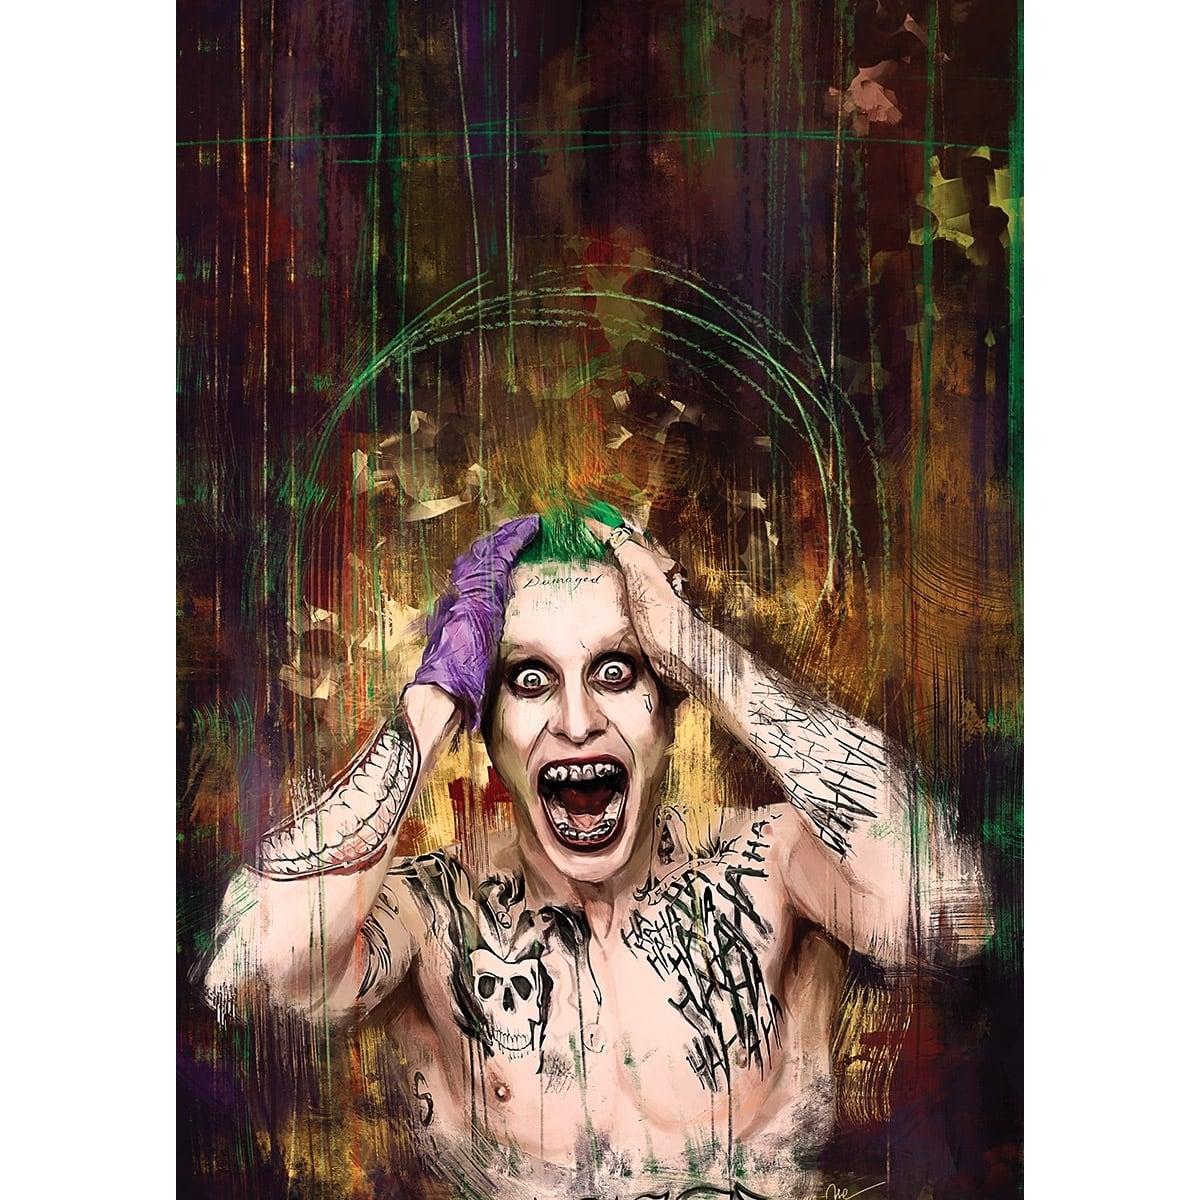 Tableau moderne du joker en version d'artiste sur toile